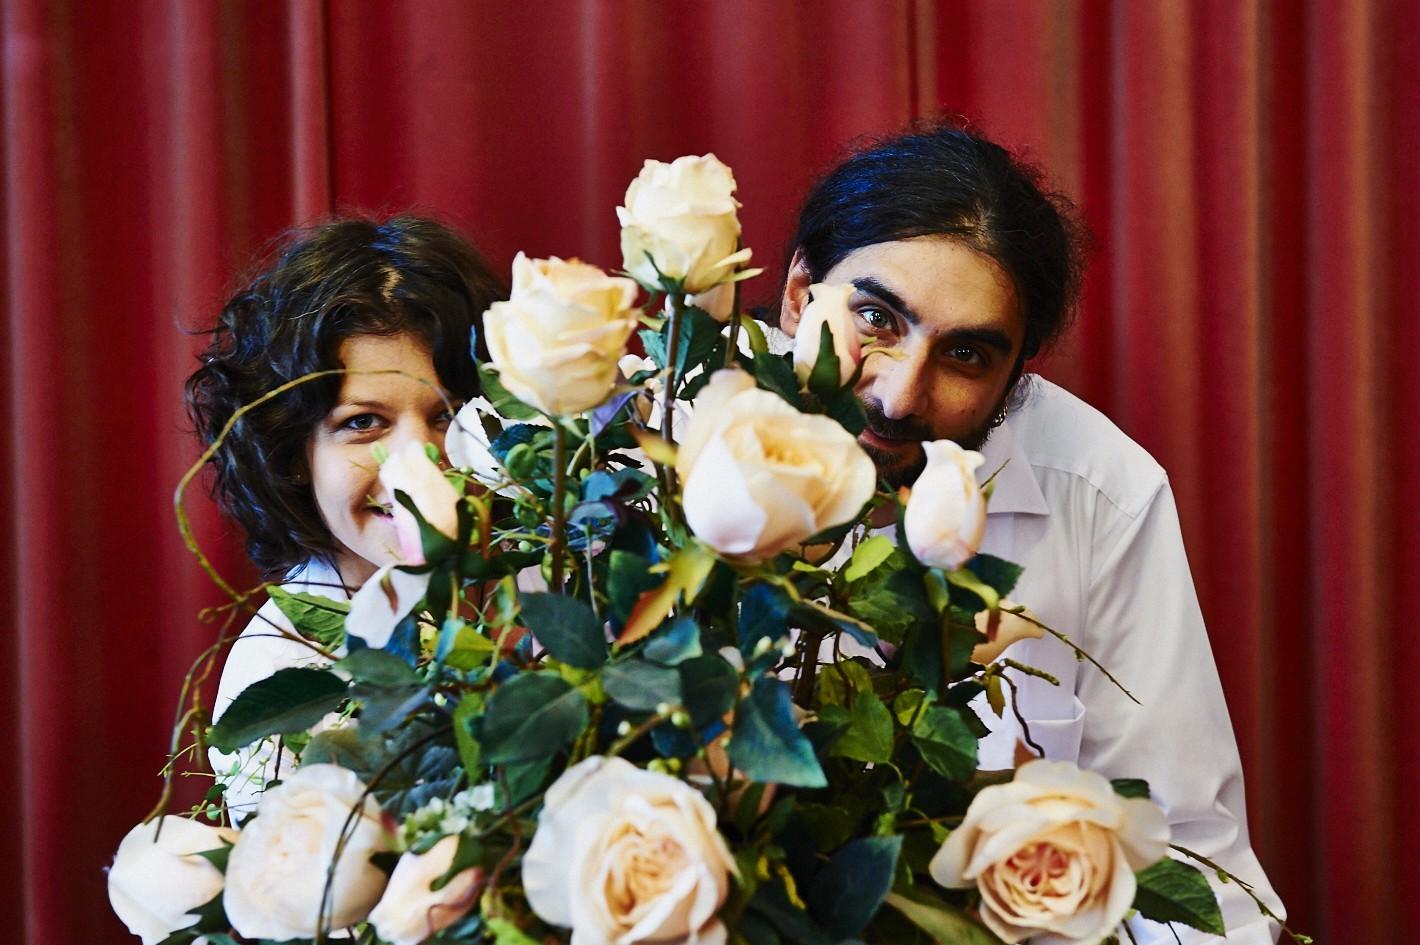 Verena & Mermer © Aleksandra Pawloff